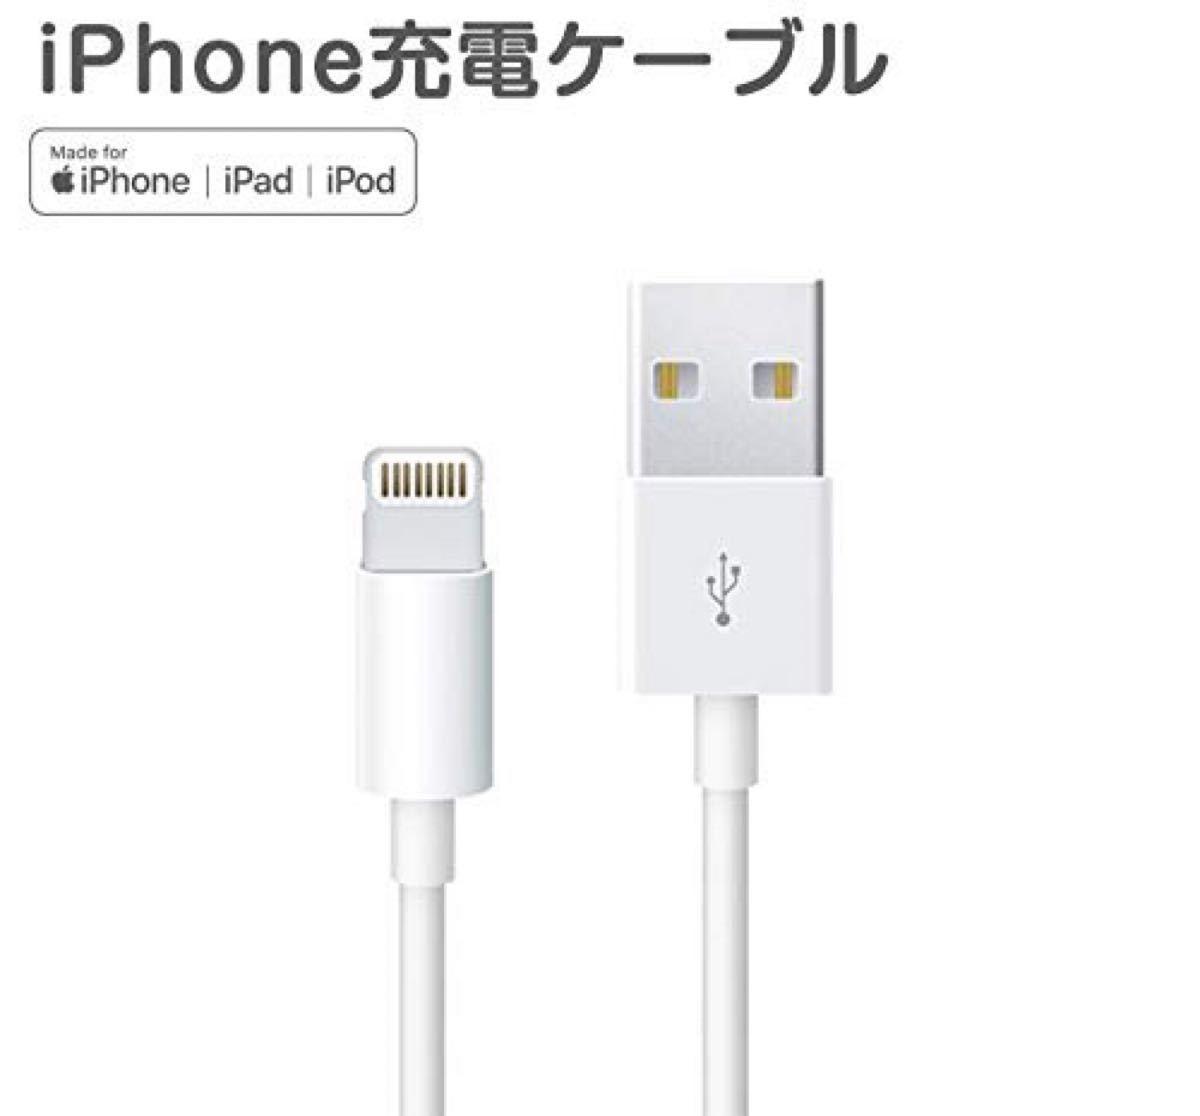 iPhone充電ケーブル Lightningケーブル 急速充電 充電器 純正品質 2m×5本セット